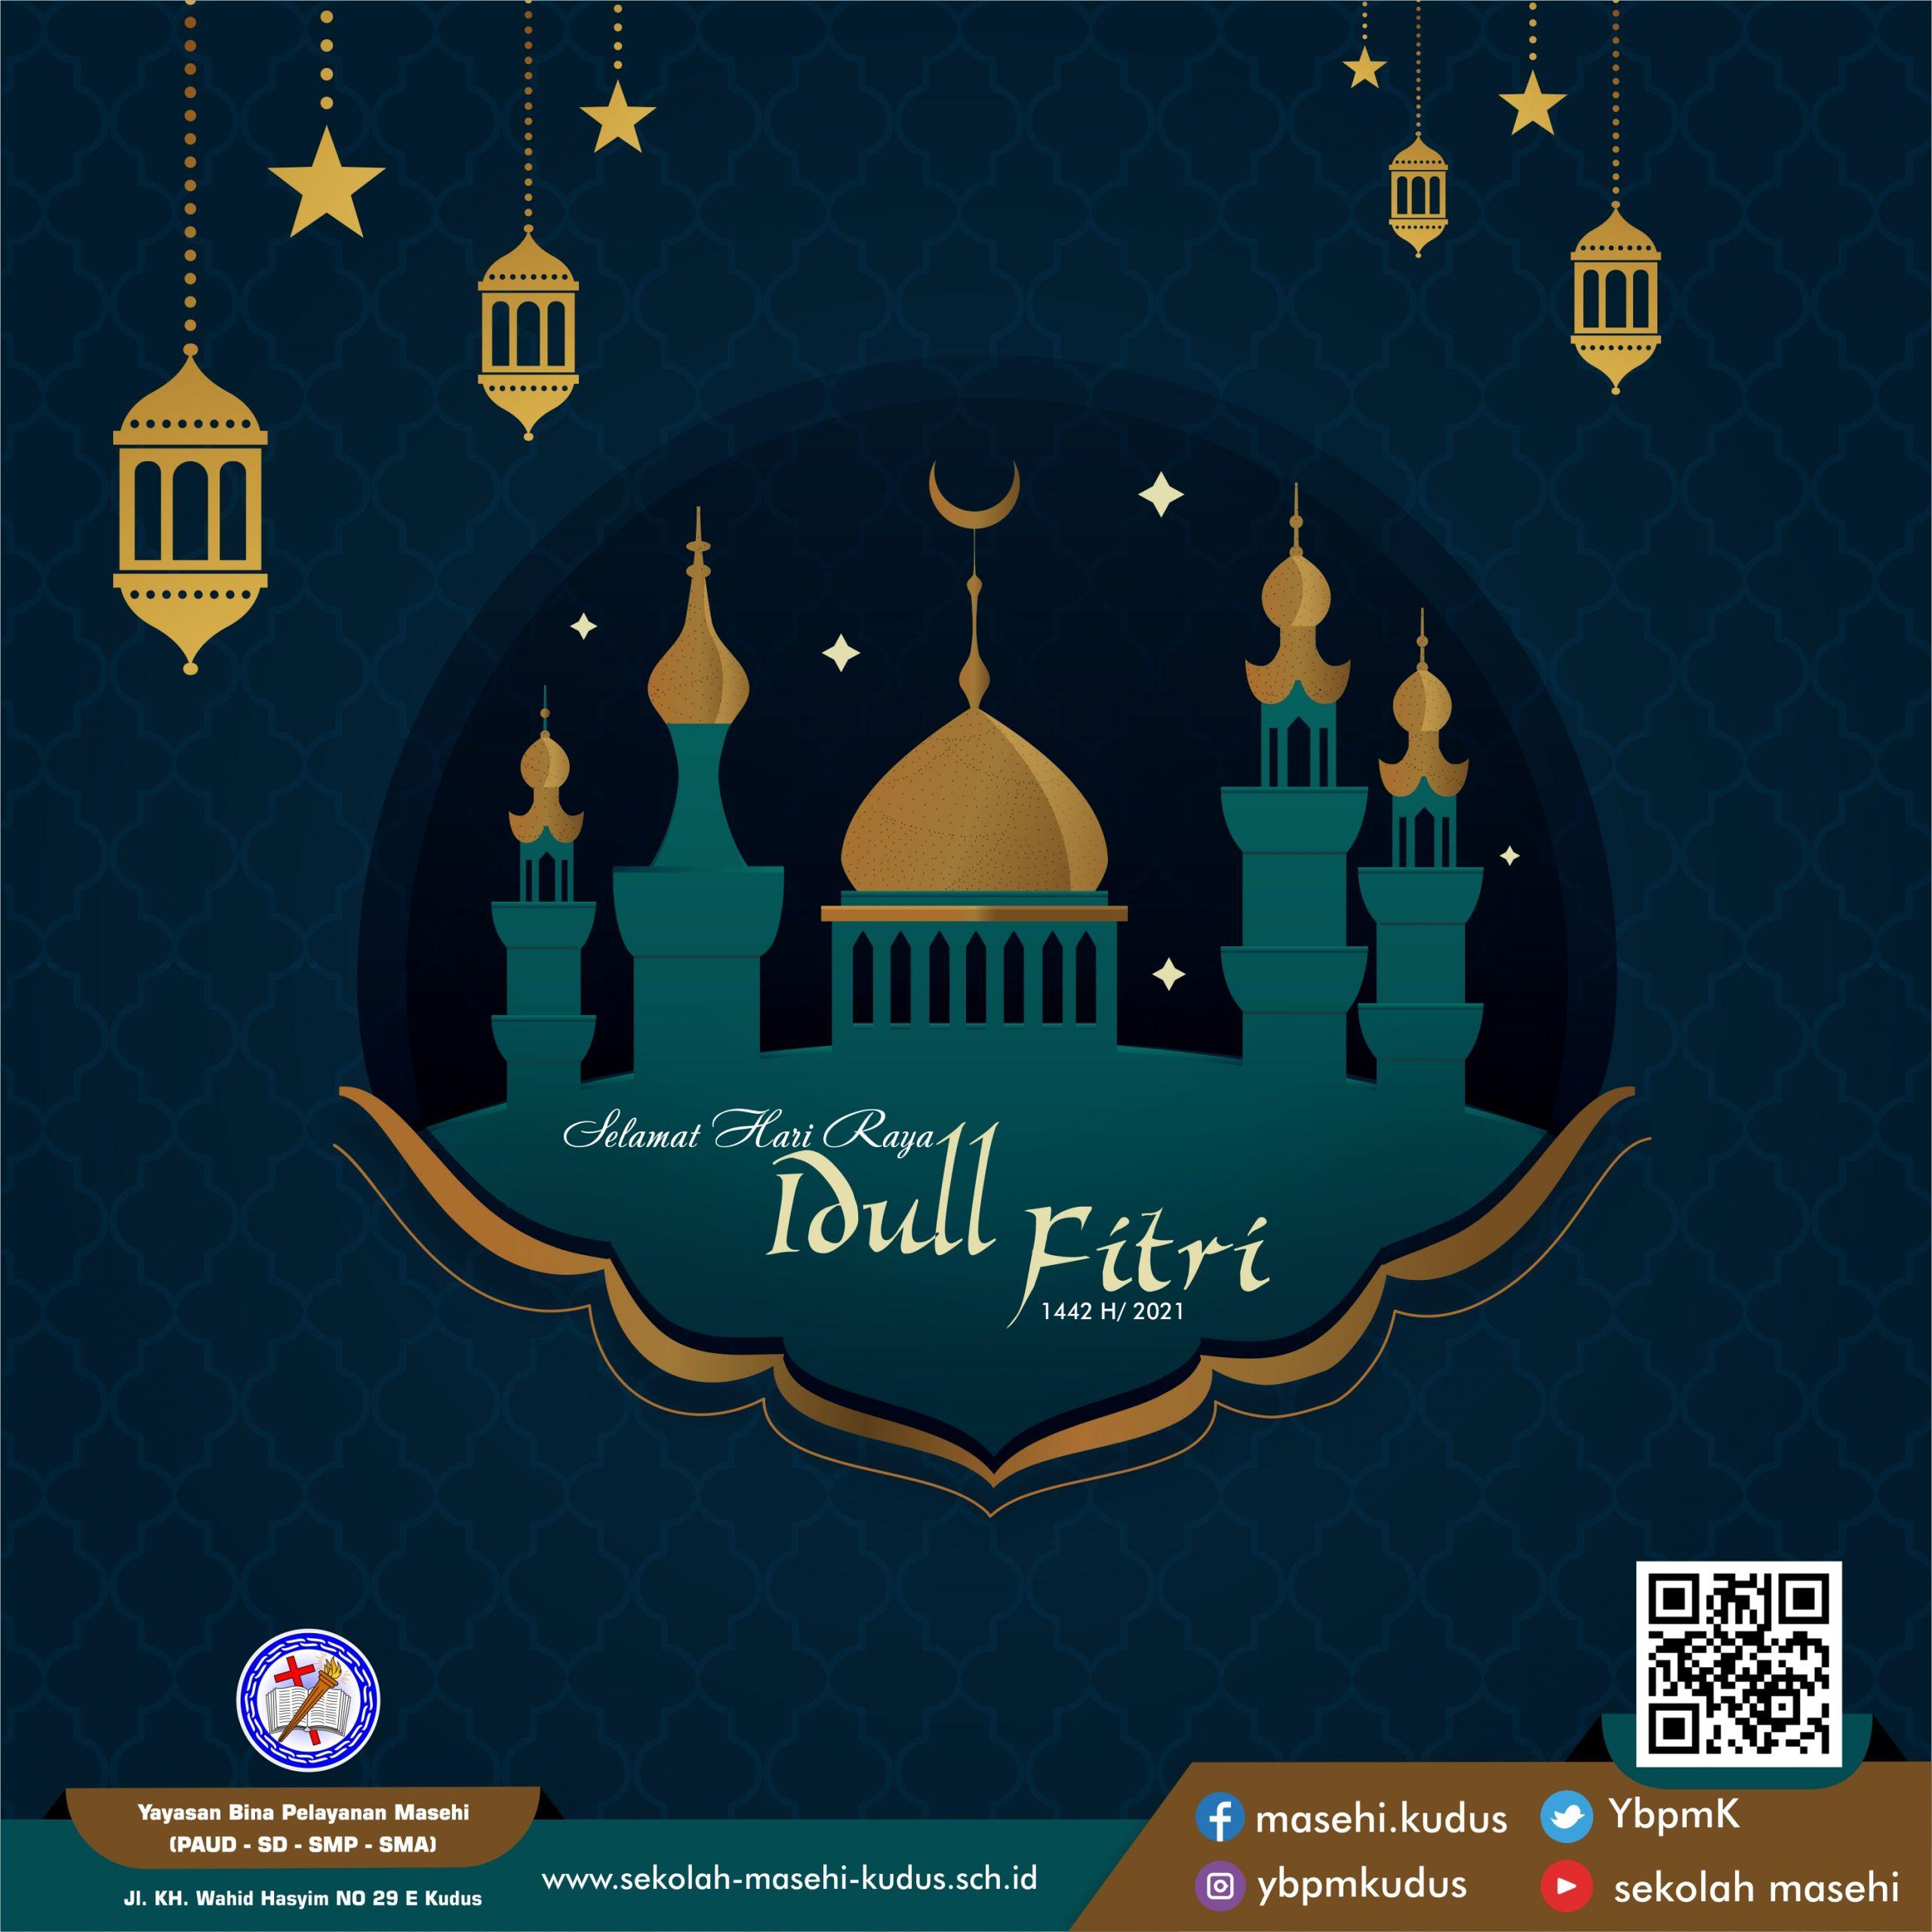 Selamat Idull Fitri